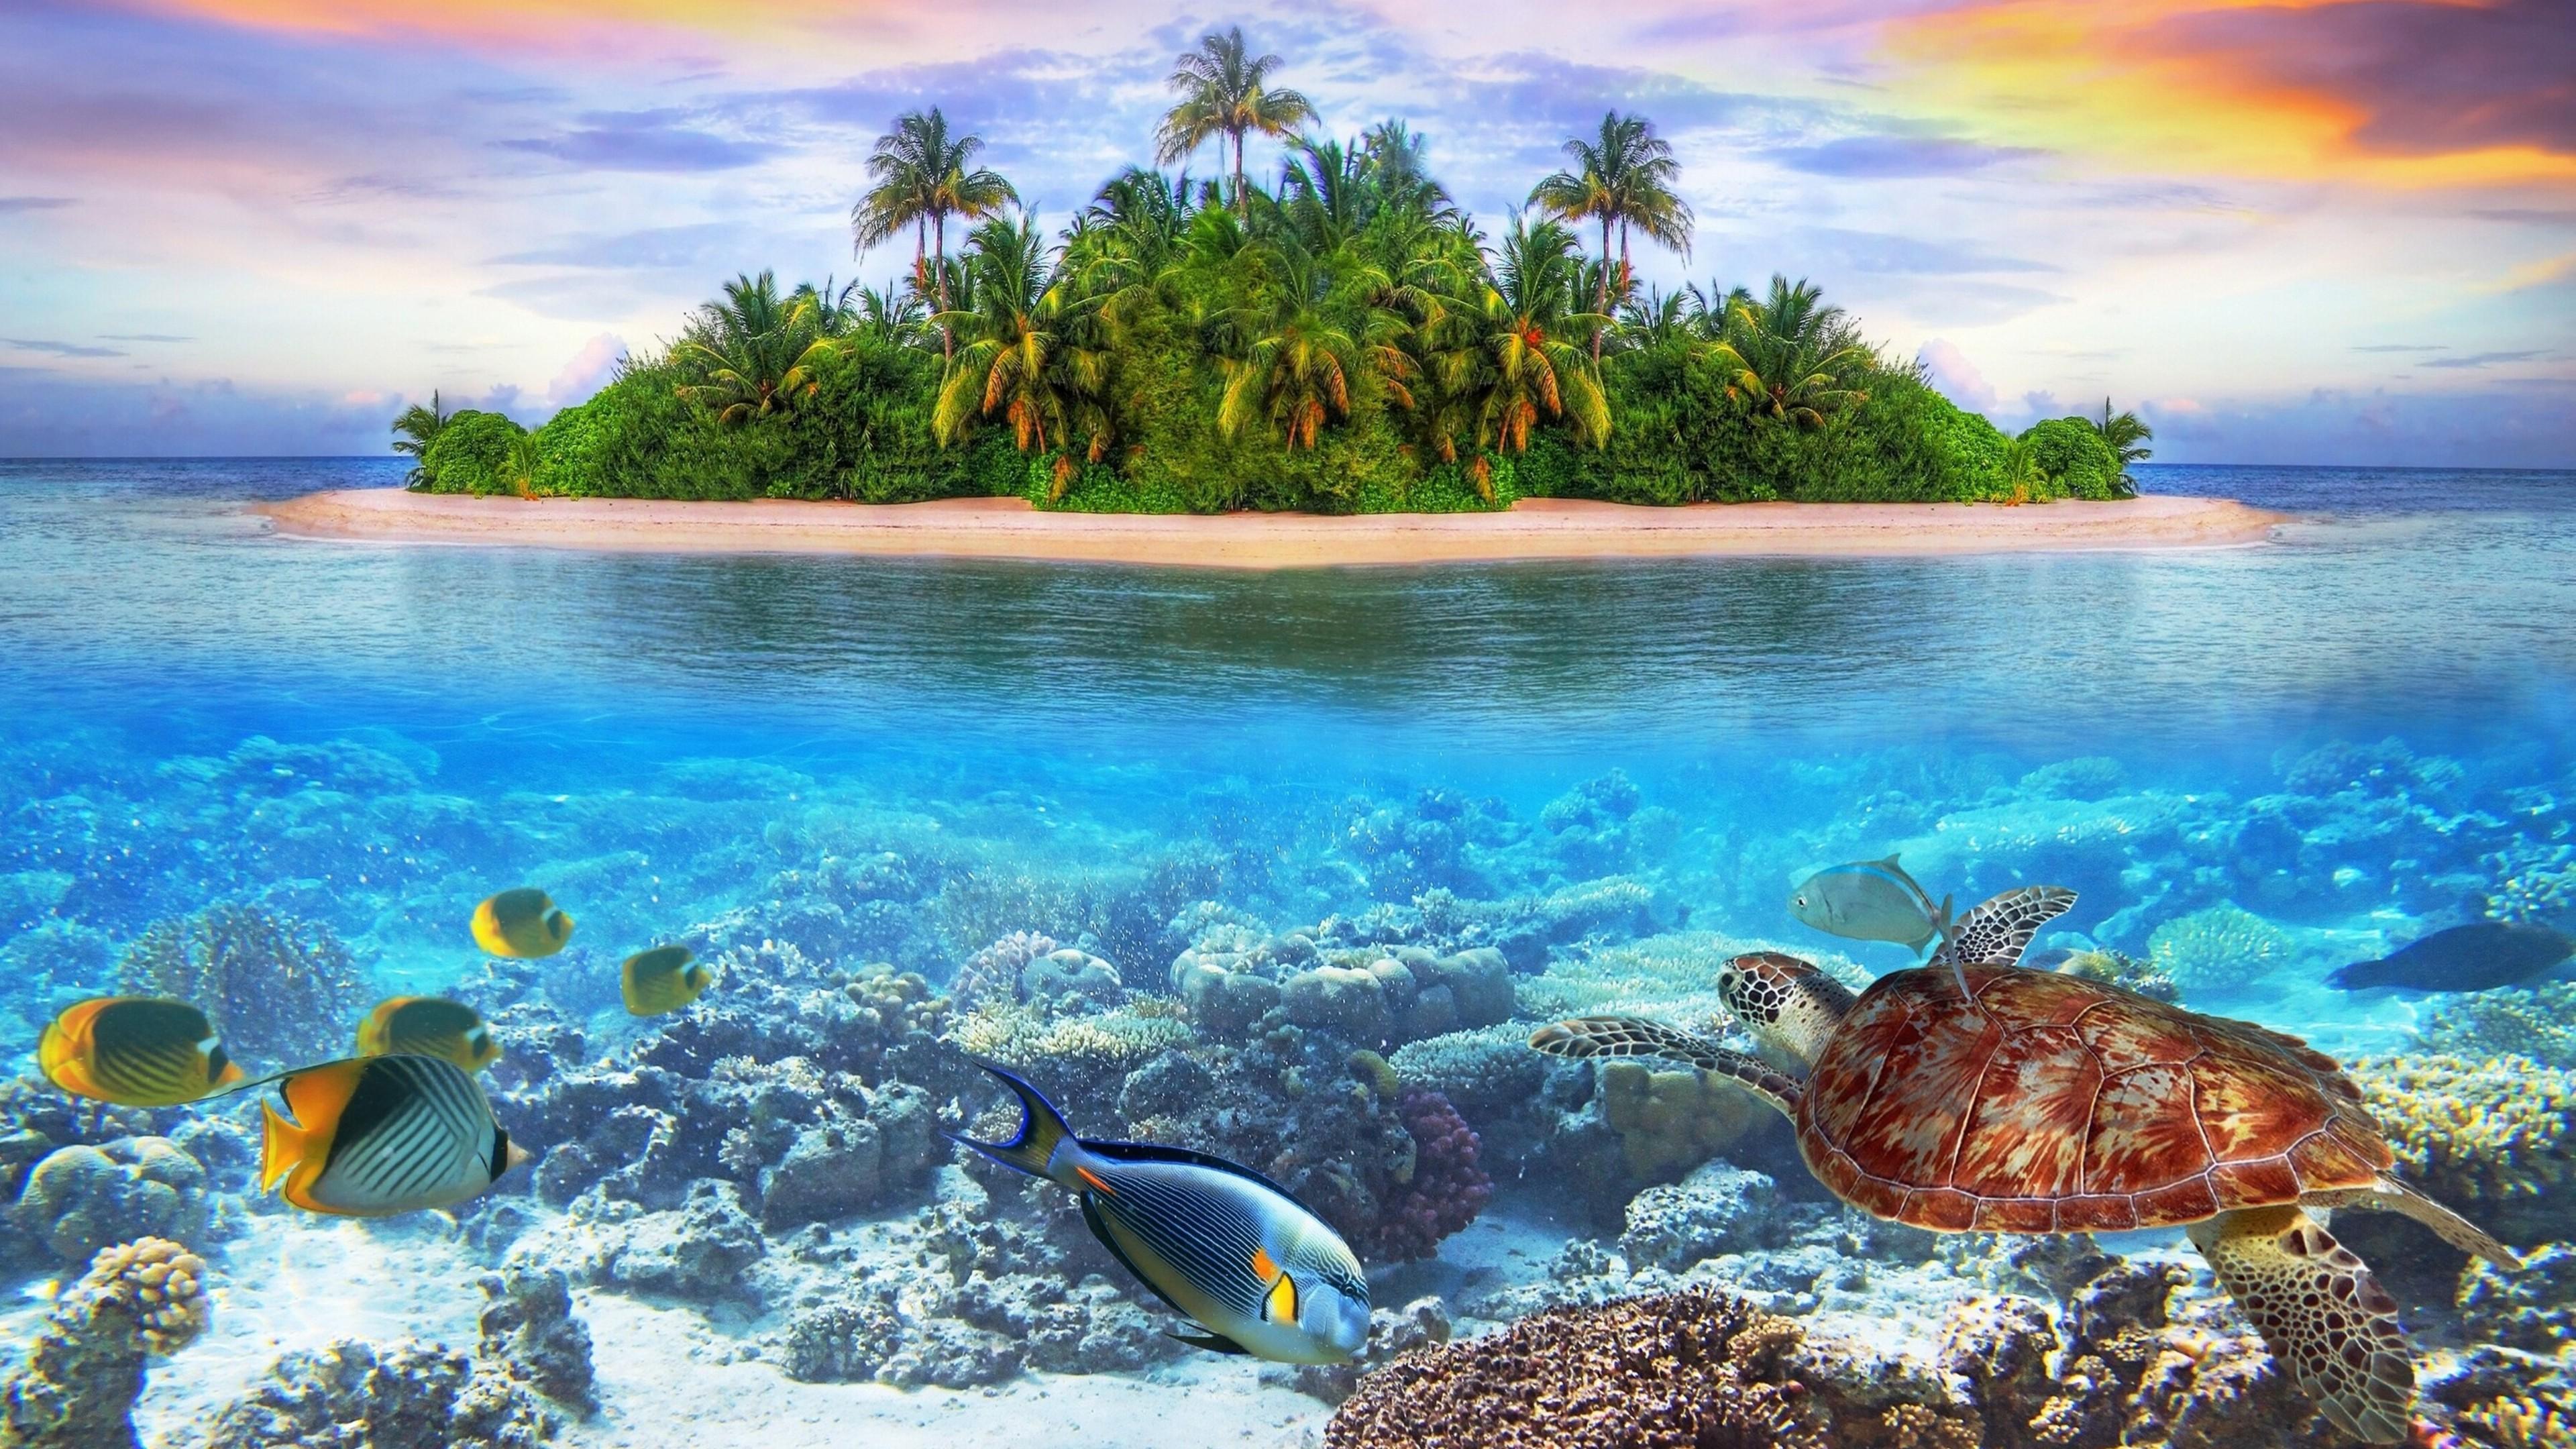 Great Barrier Reef Turtle 4k Wallpapers Wallpaper Cave